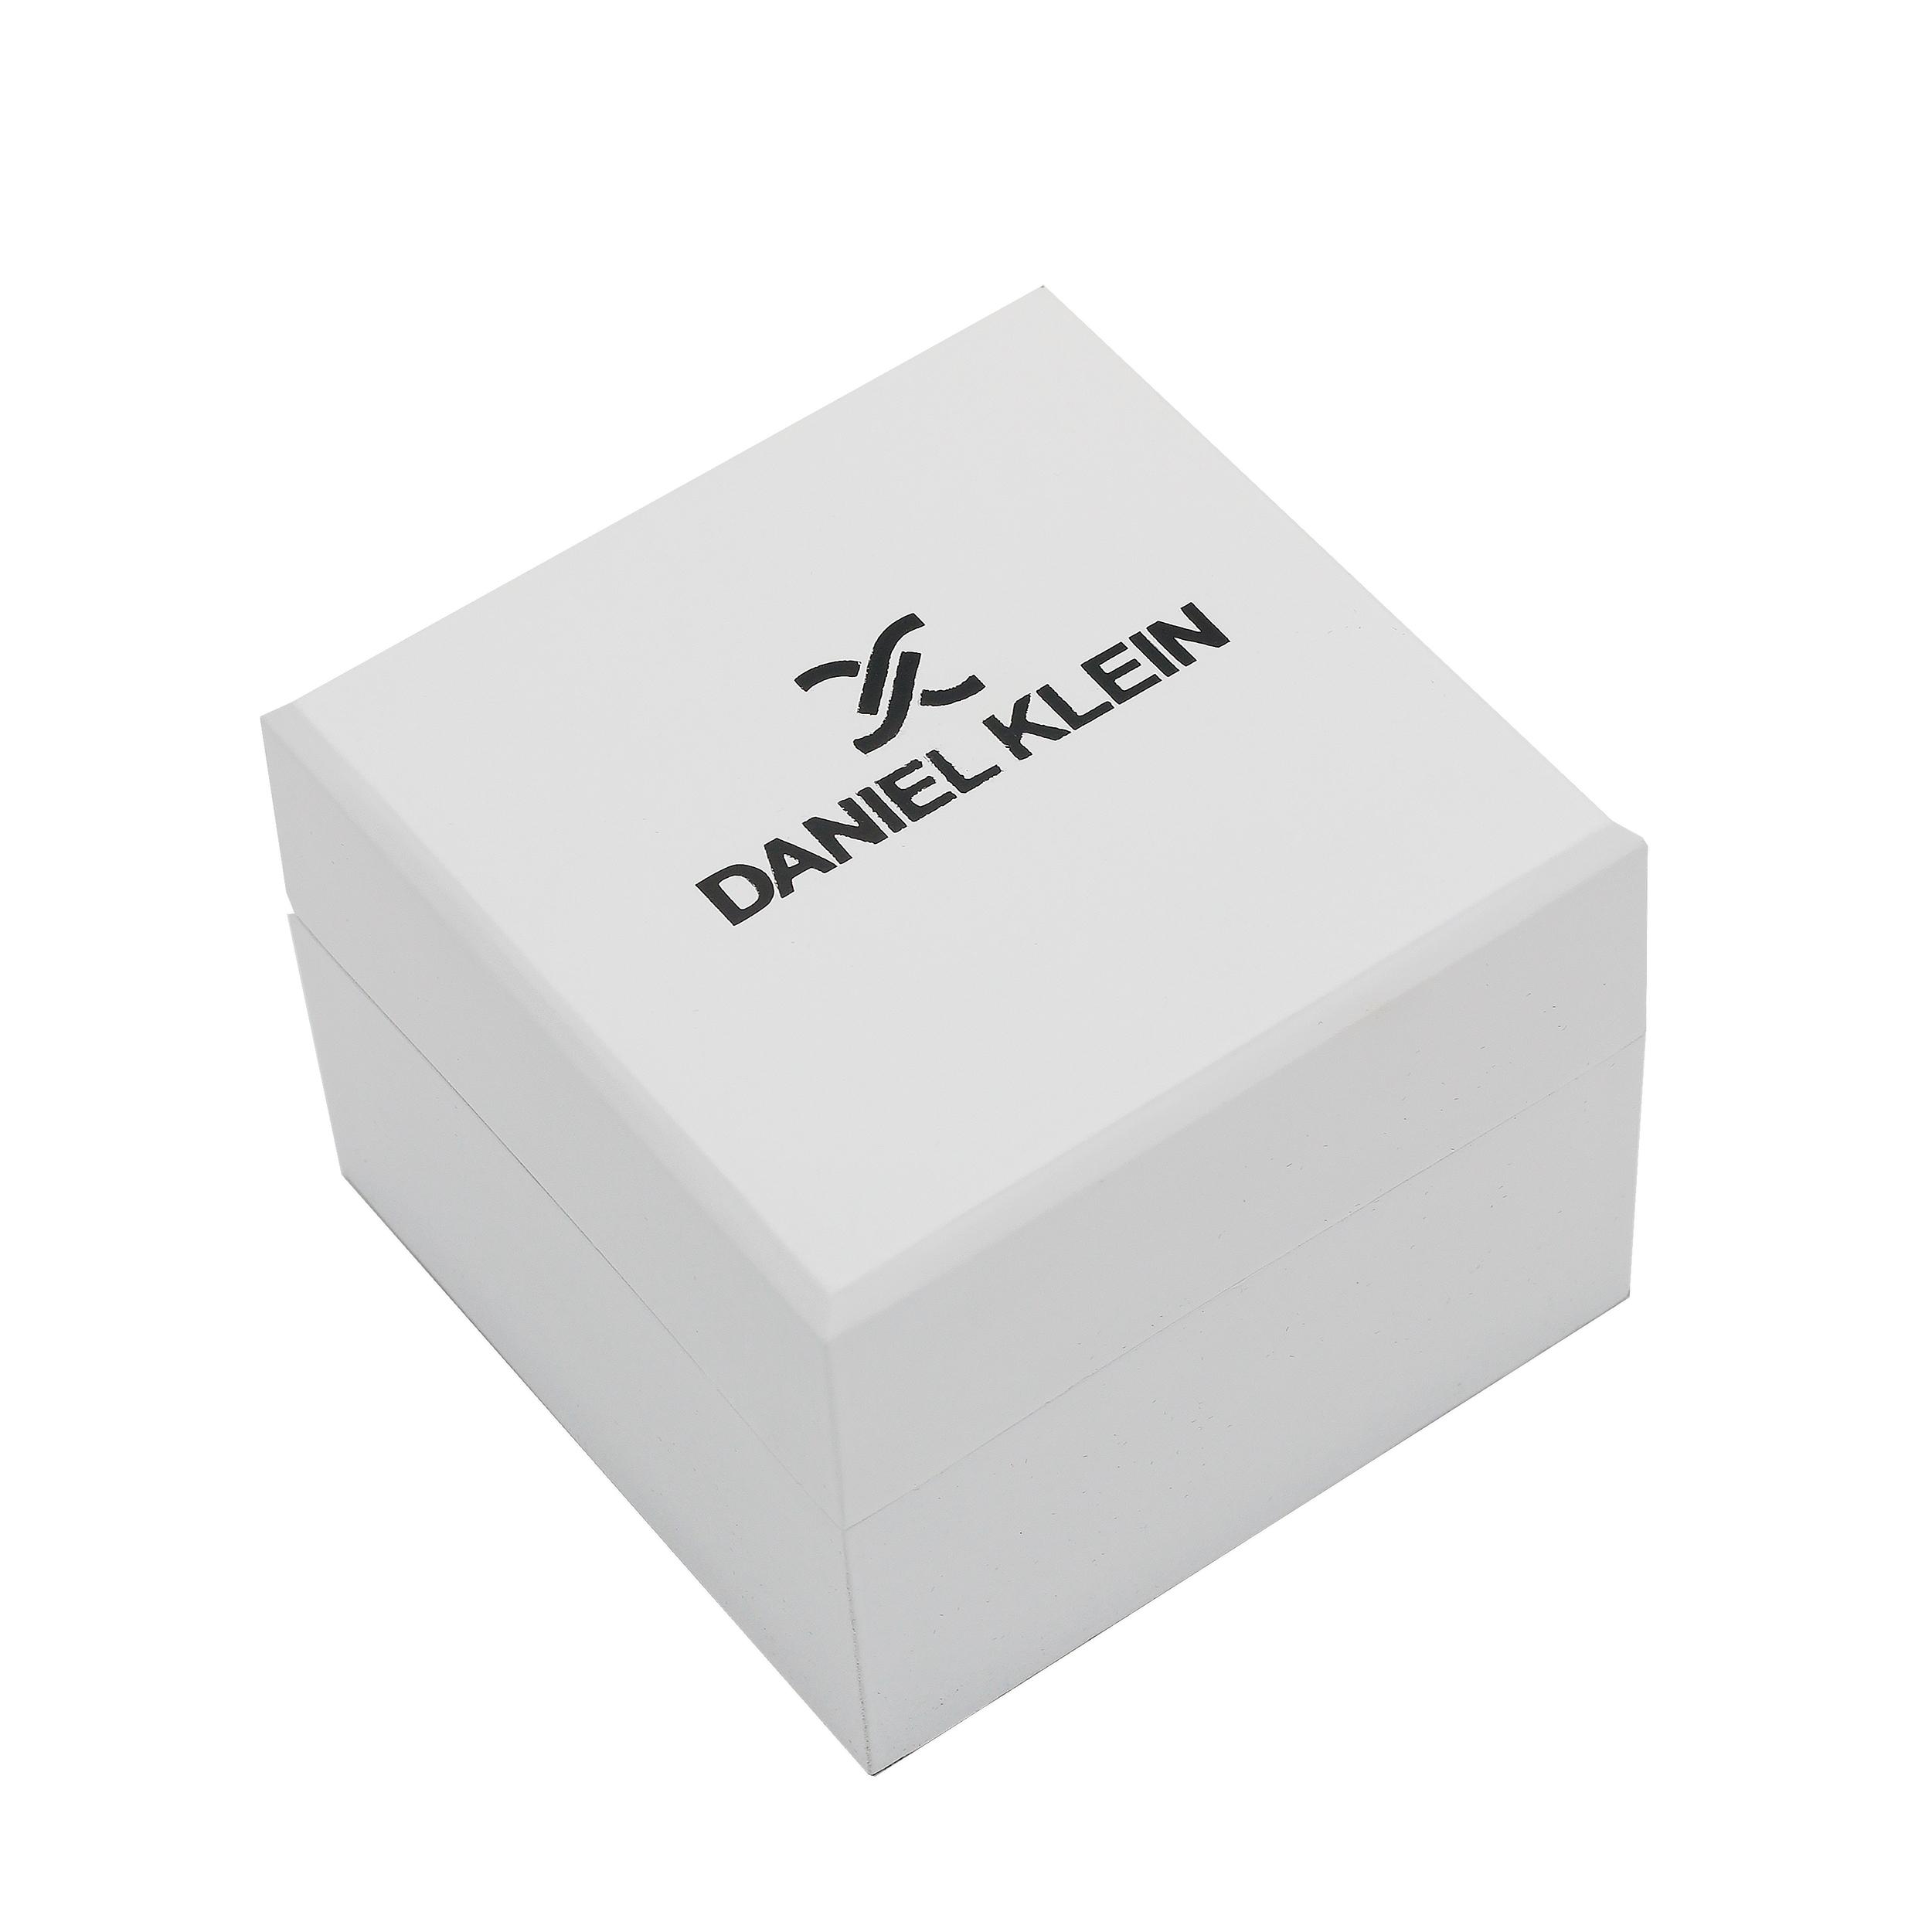 خرید و قیمت                      ساعت مچی  زنانه دنیل کلین مدل DK12317-5